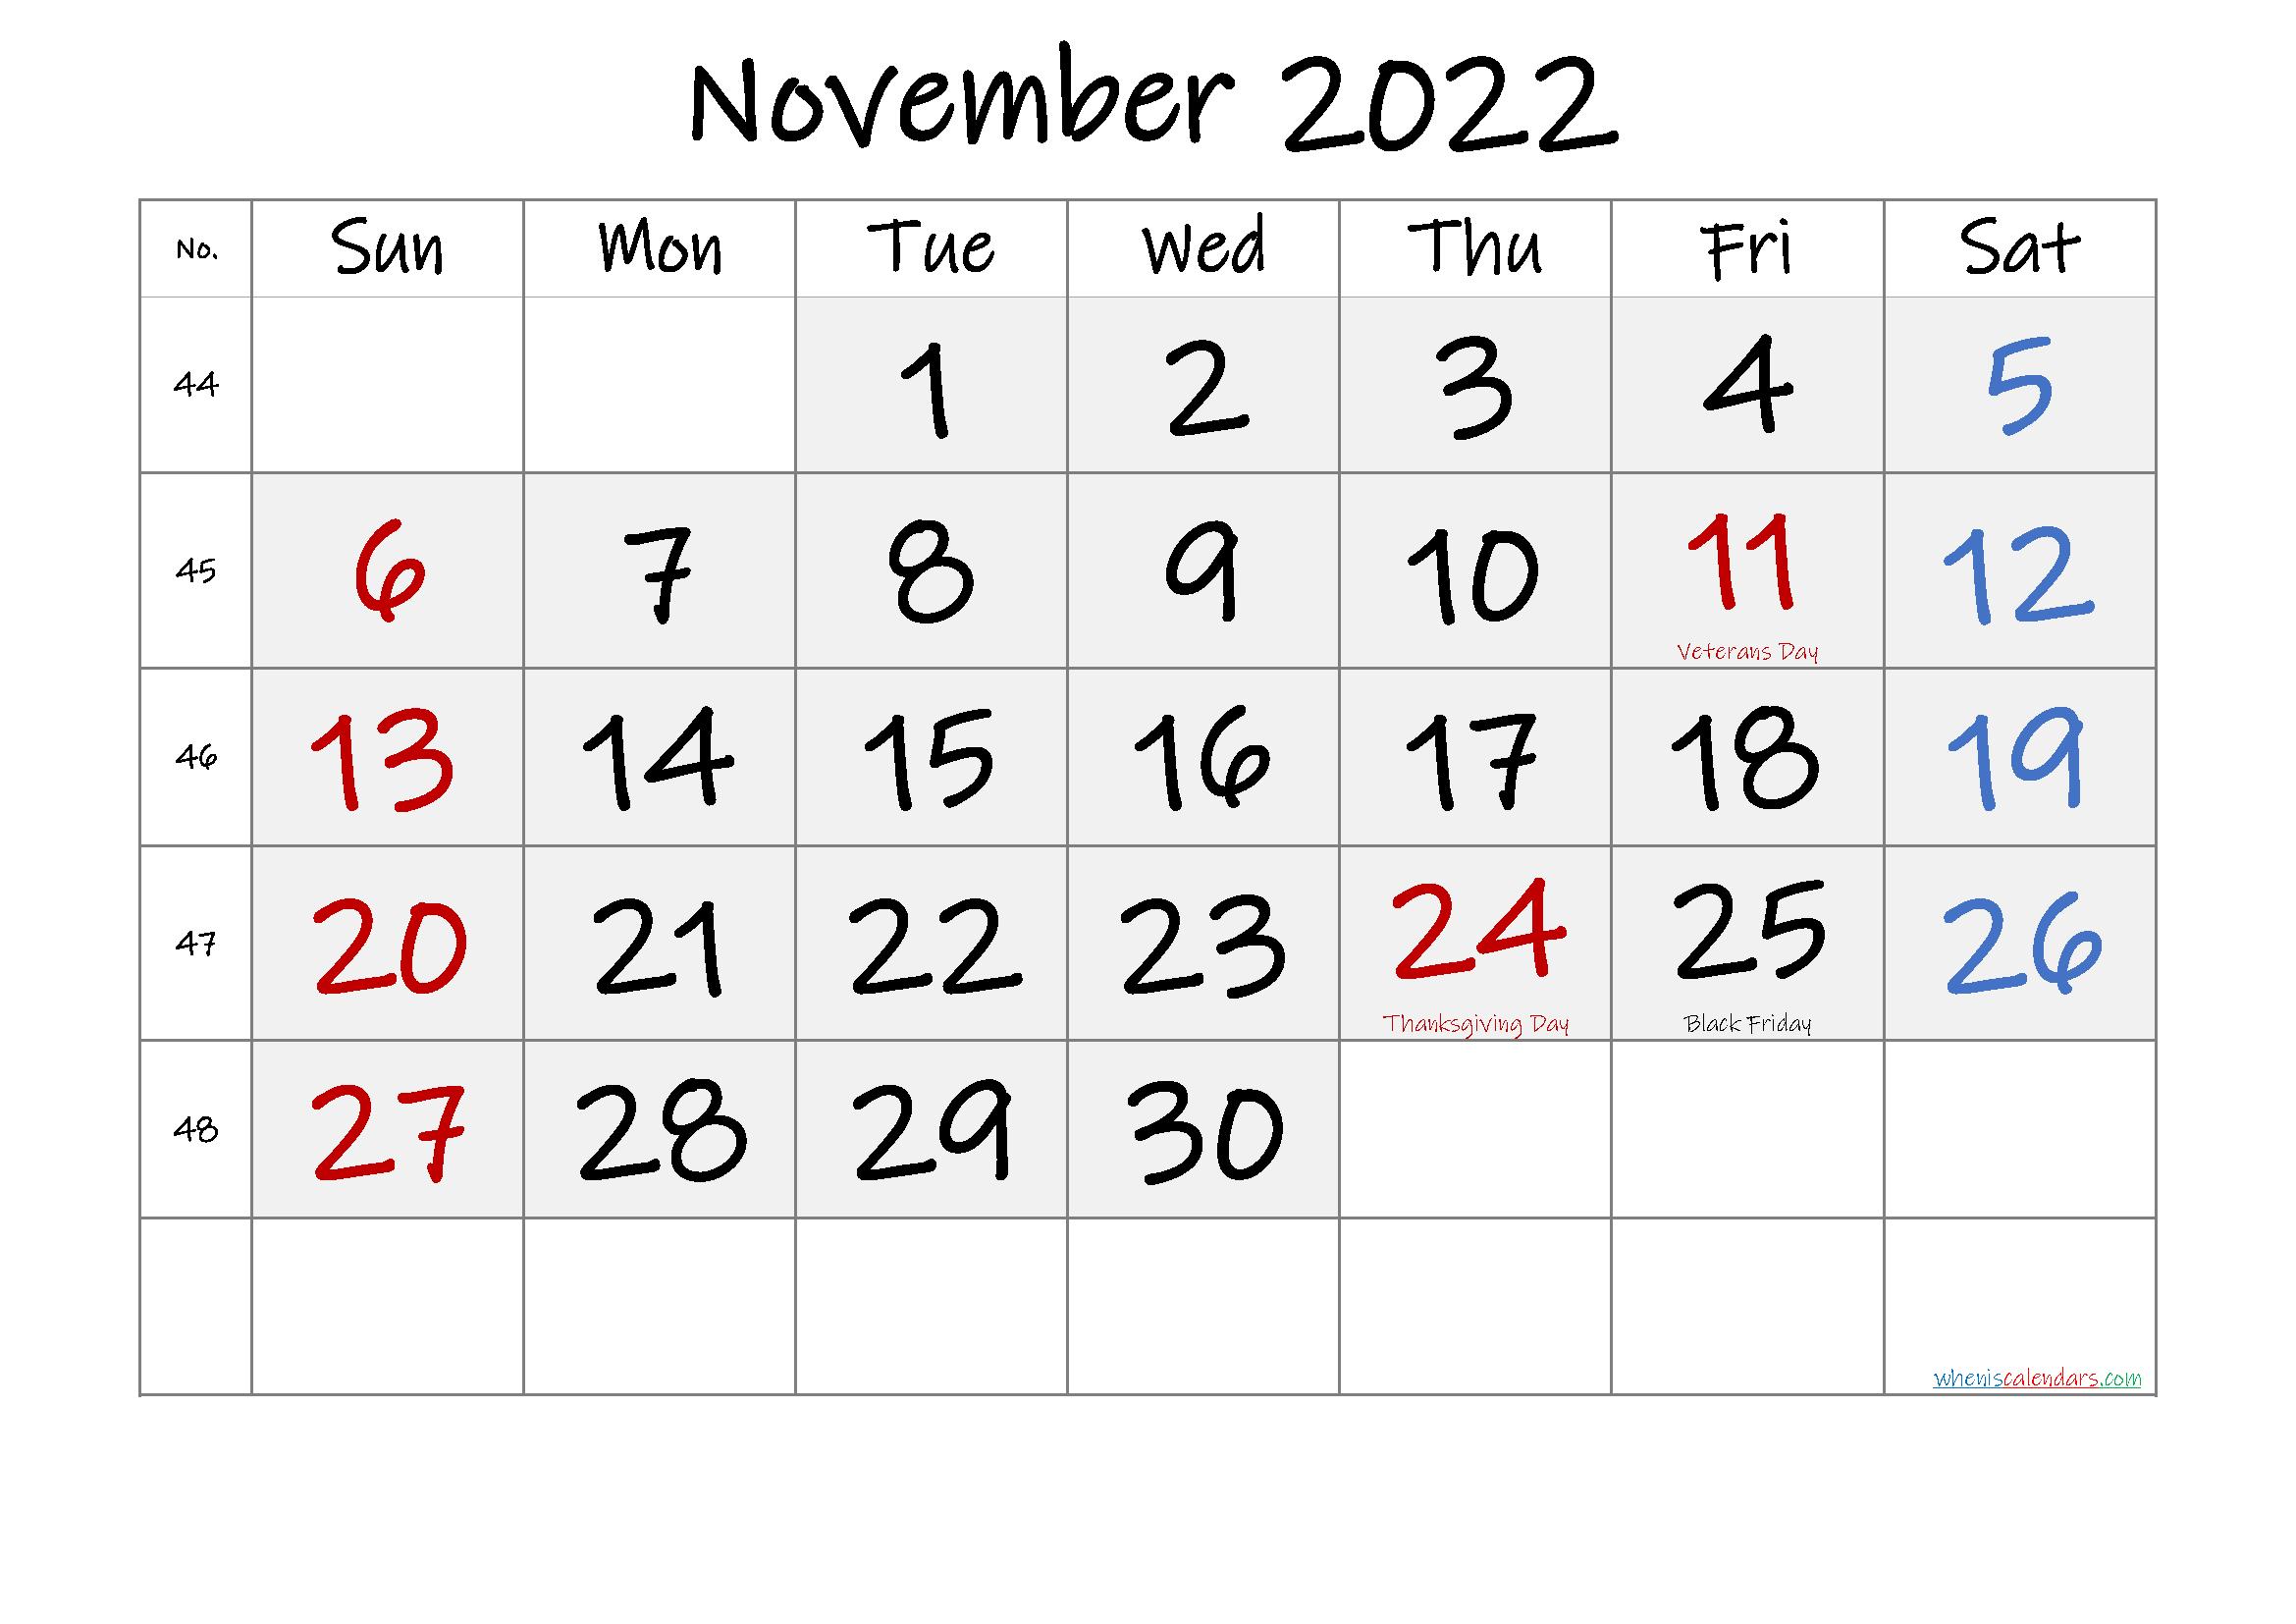 Free Printable November 2022 Calendar with Holidays